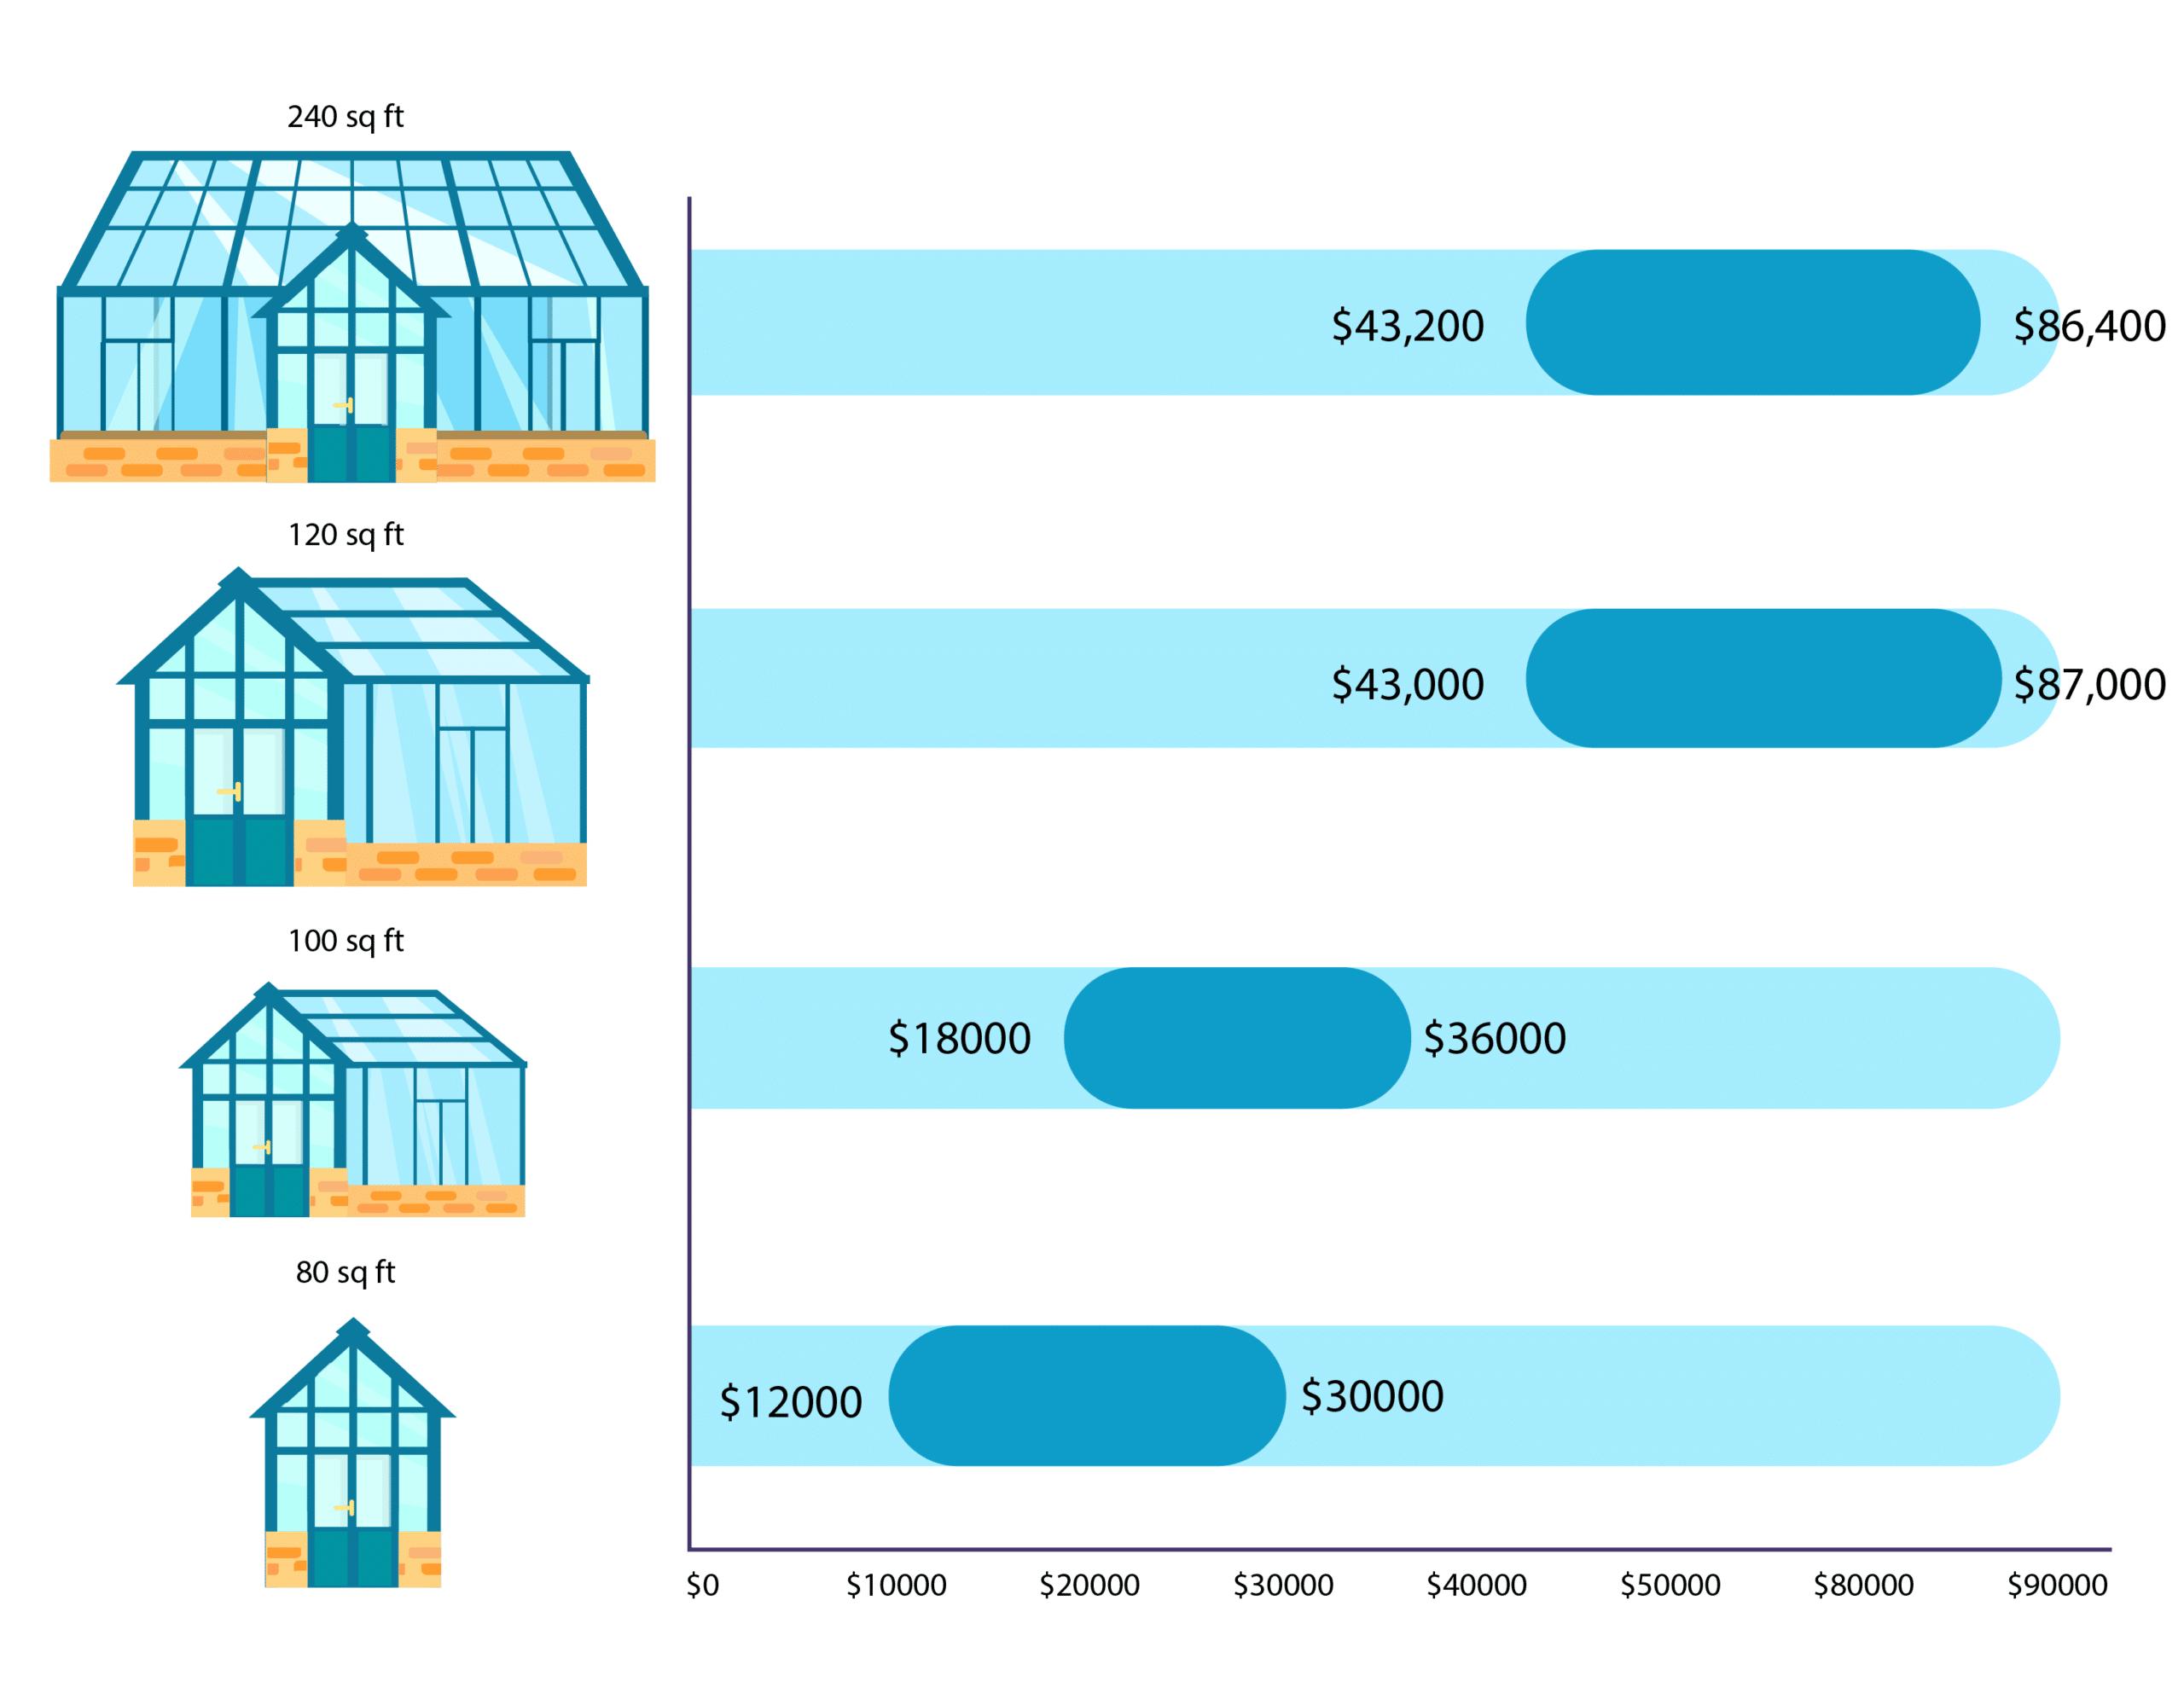 Sunroom price according to size